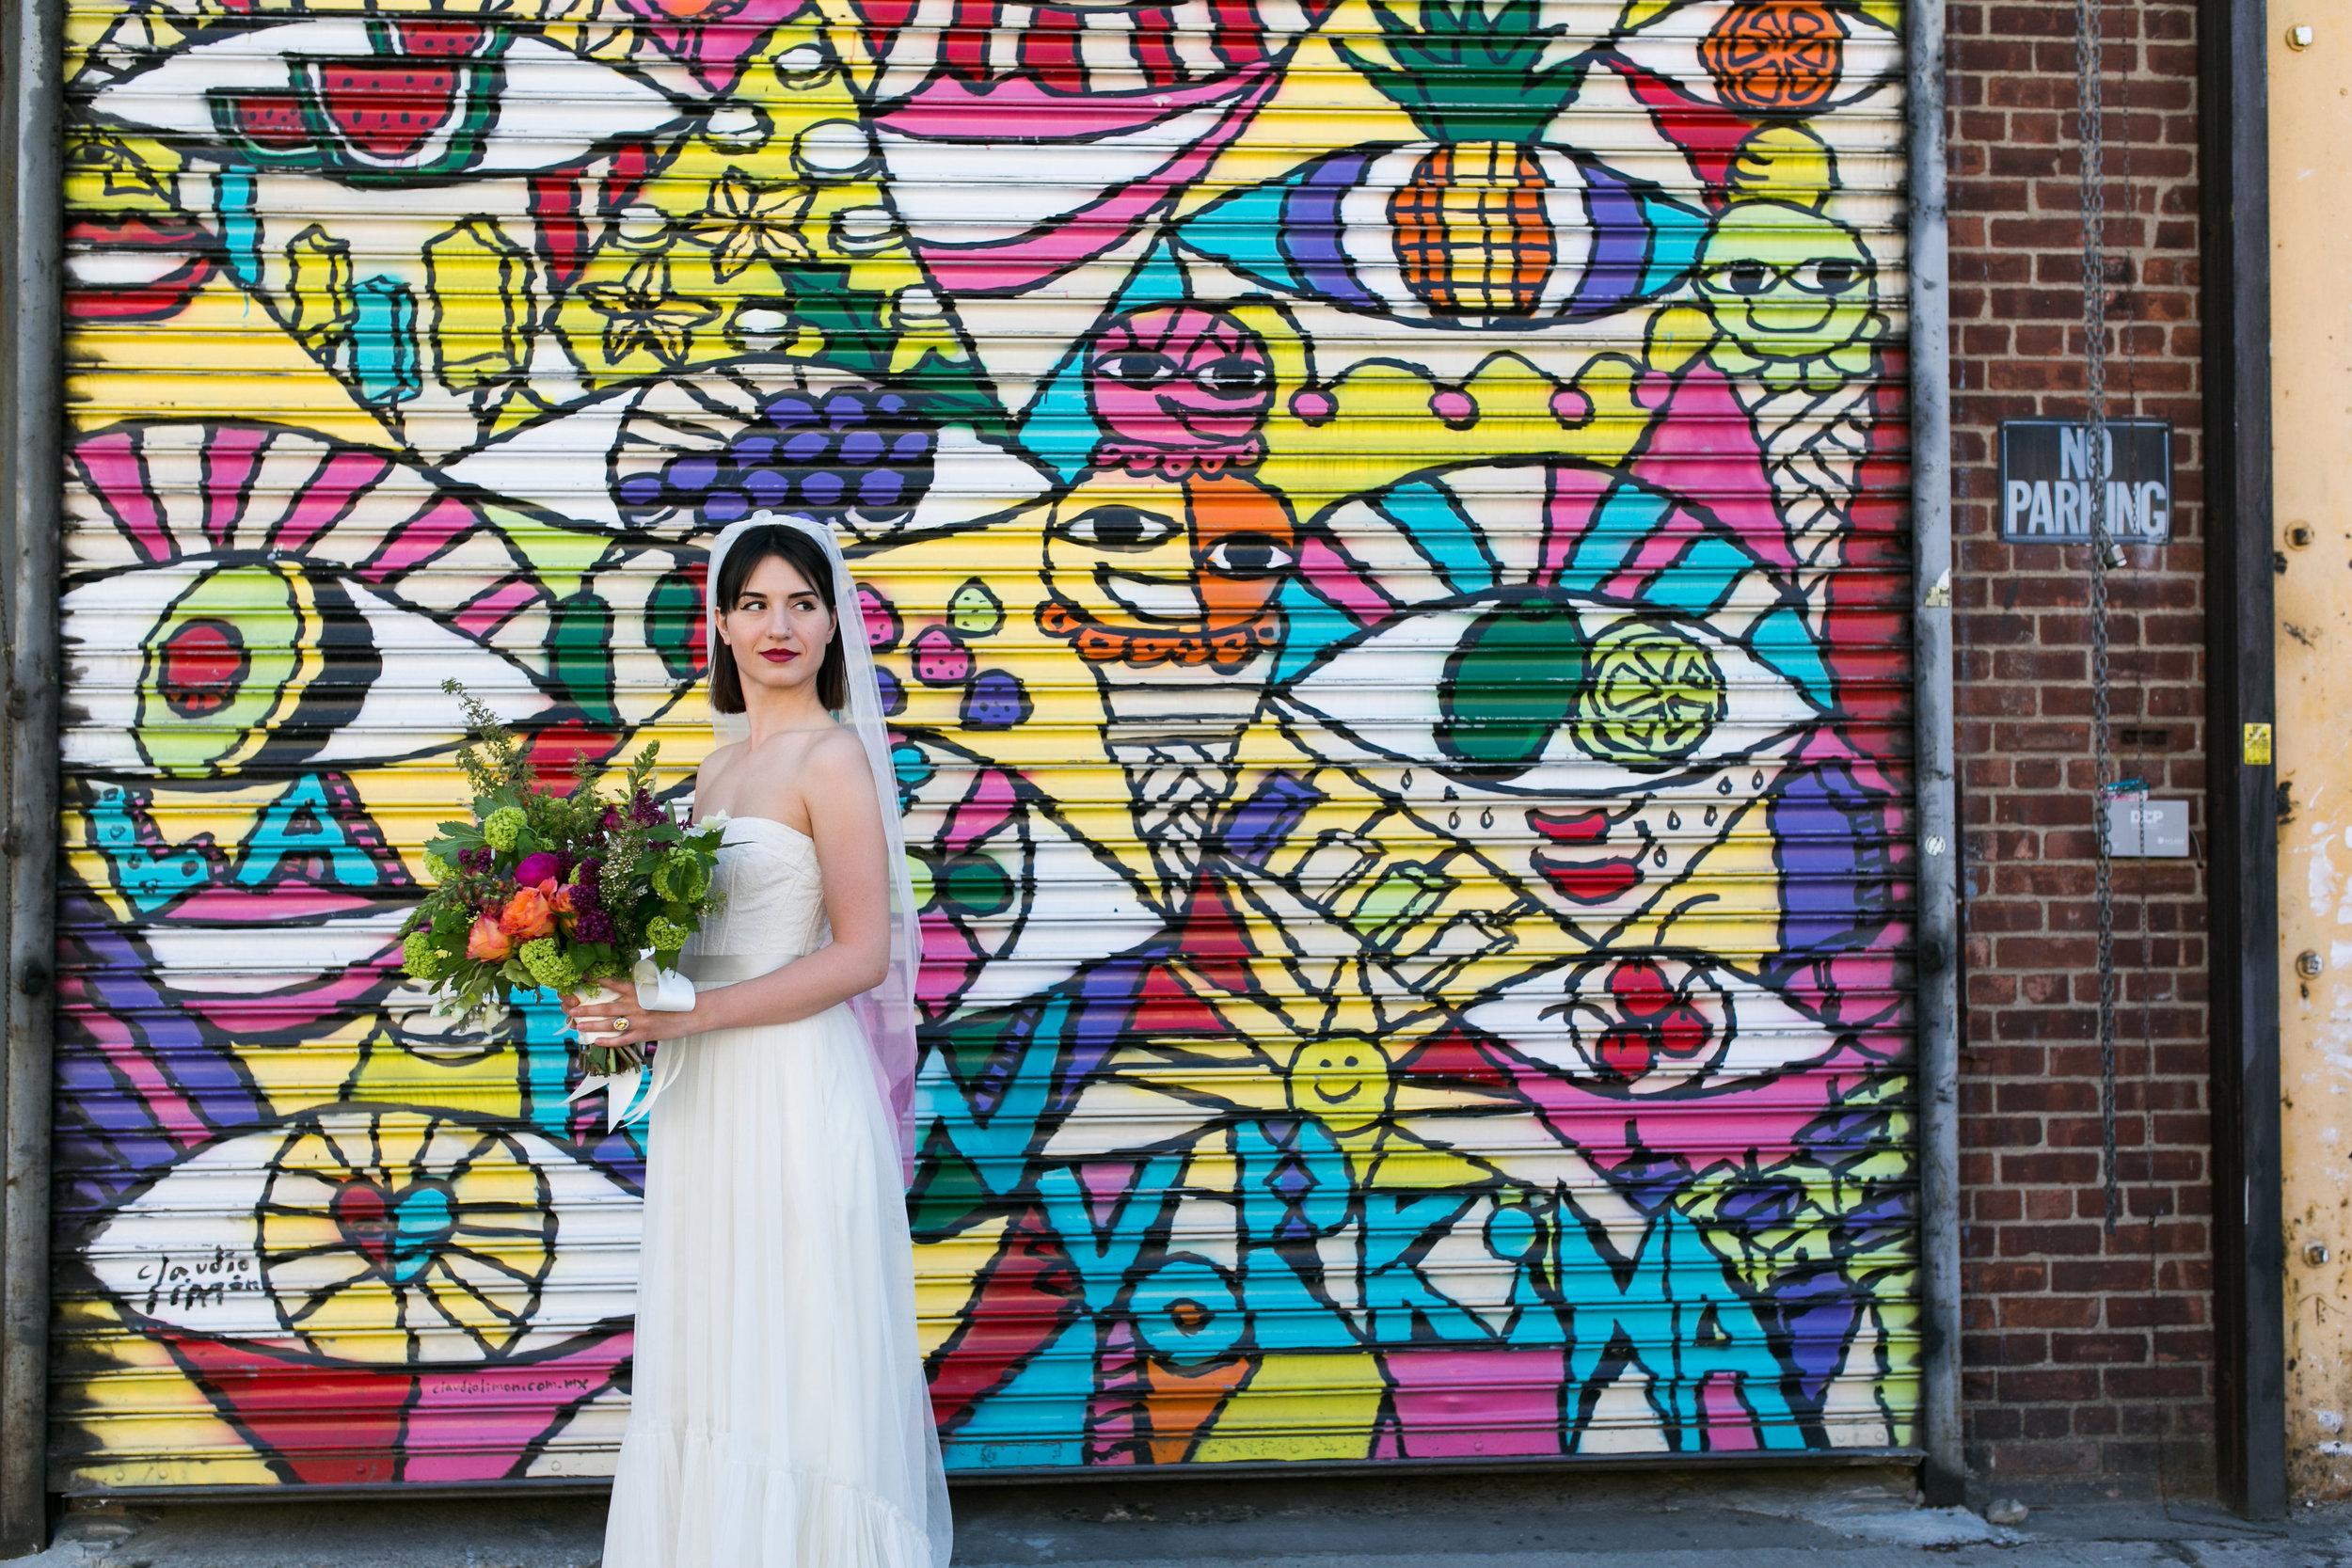 033_NYC-wedding-photographer-Amber-Marlow.jpg